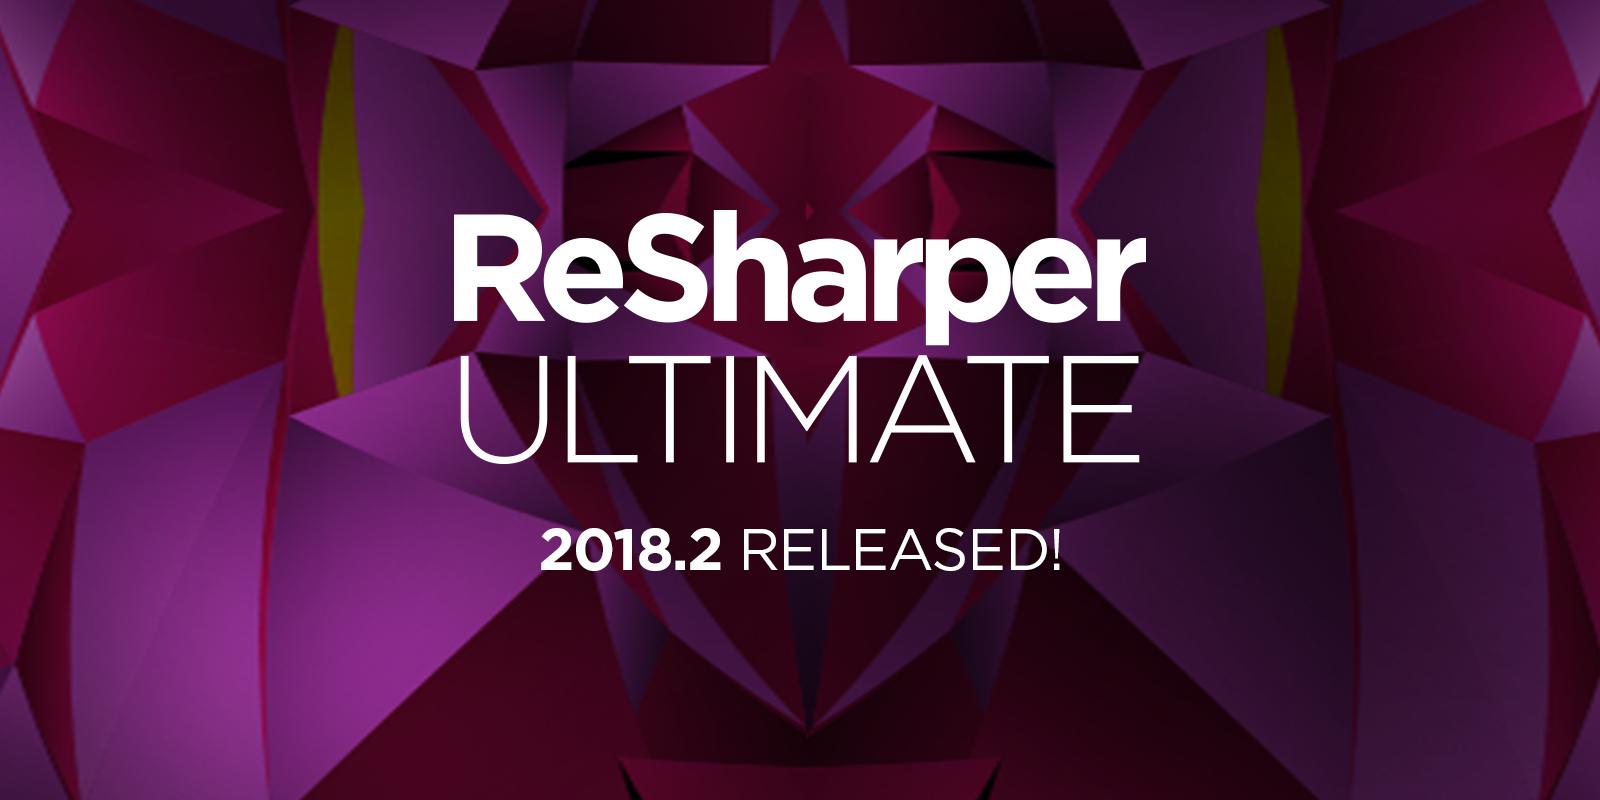 ReSharper Ultimate 2018.2 hits RTM